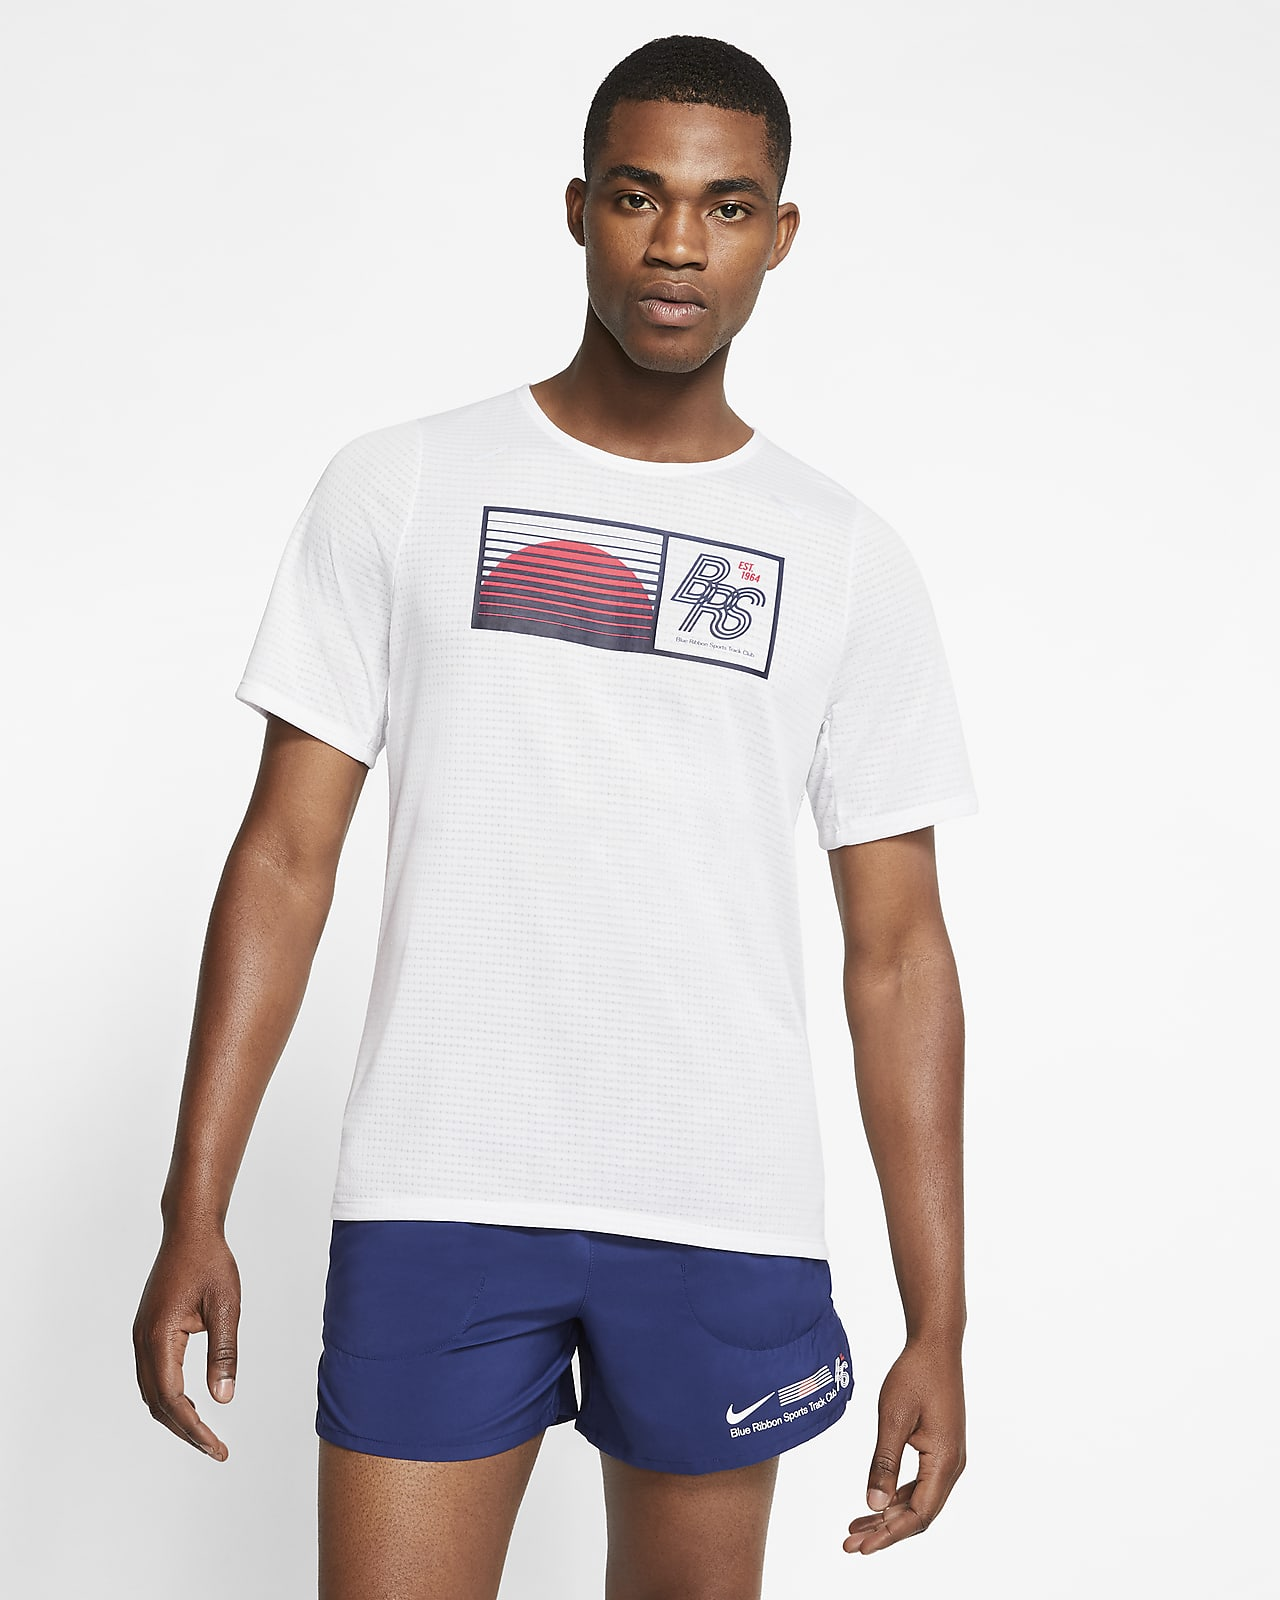 Haut de Running Nike Rise 365 Blue Ribbon Sports pour Homme